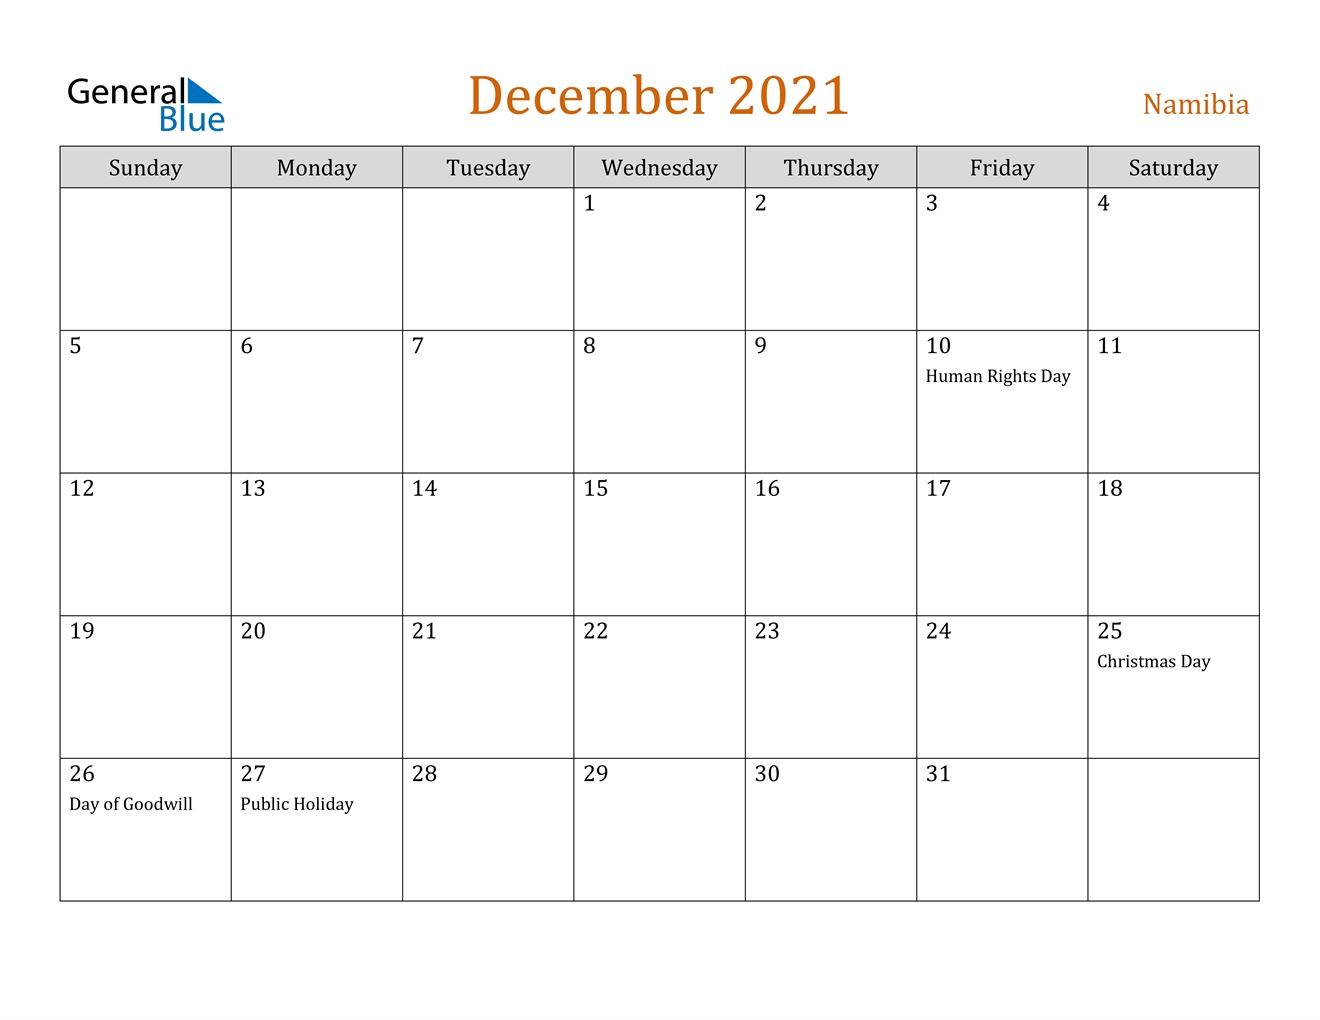 december 2021 calendar namibia